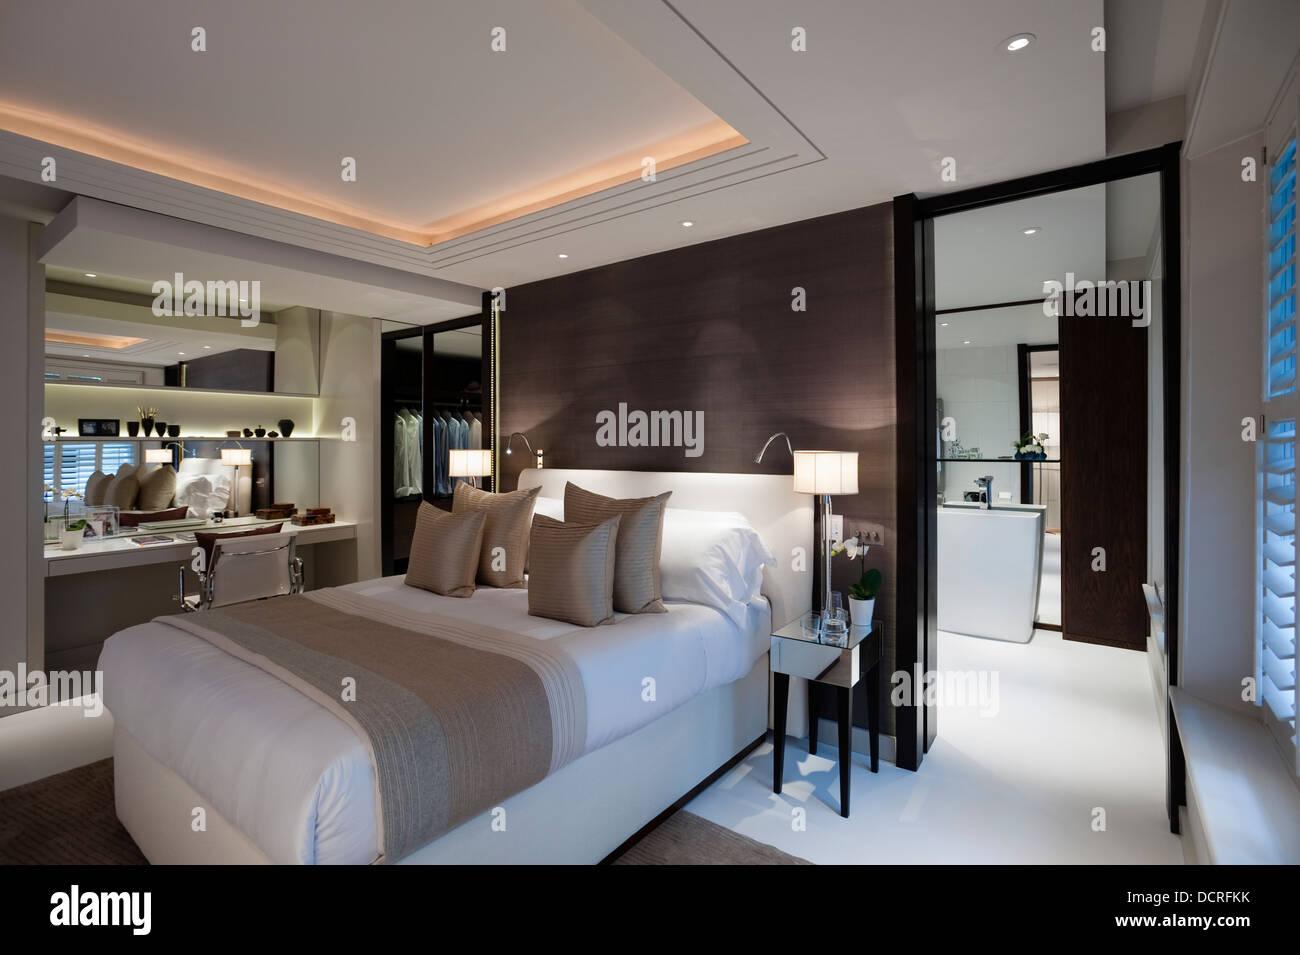 Bedroom Of London City Apartment With En Suite Bathroom